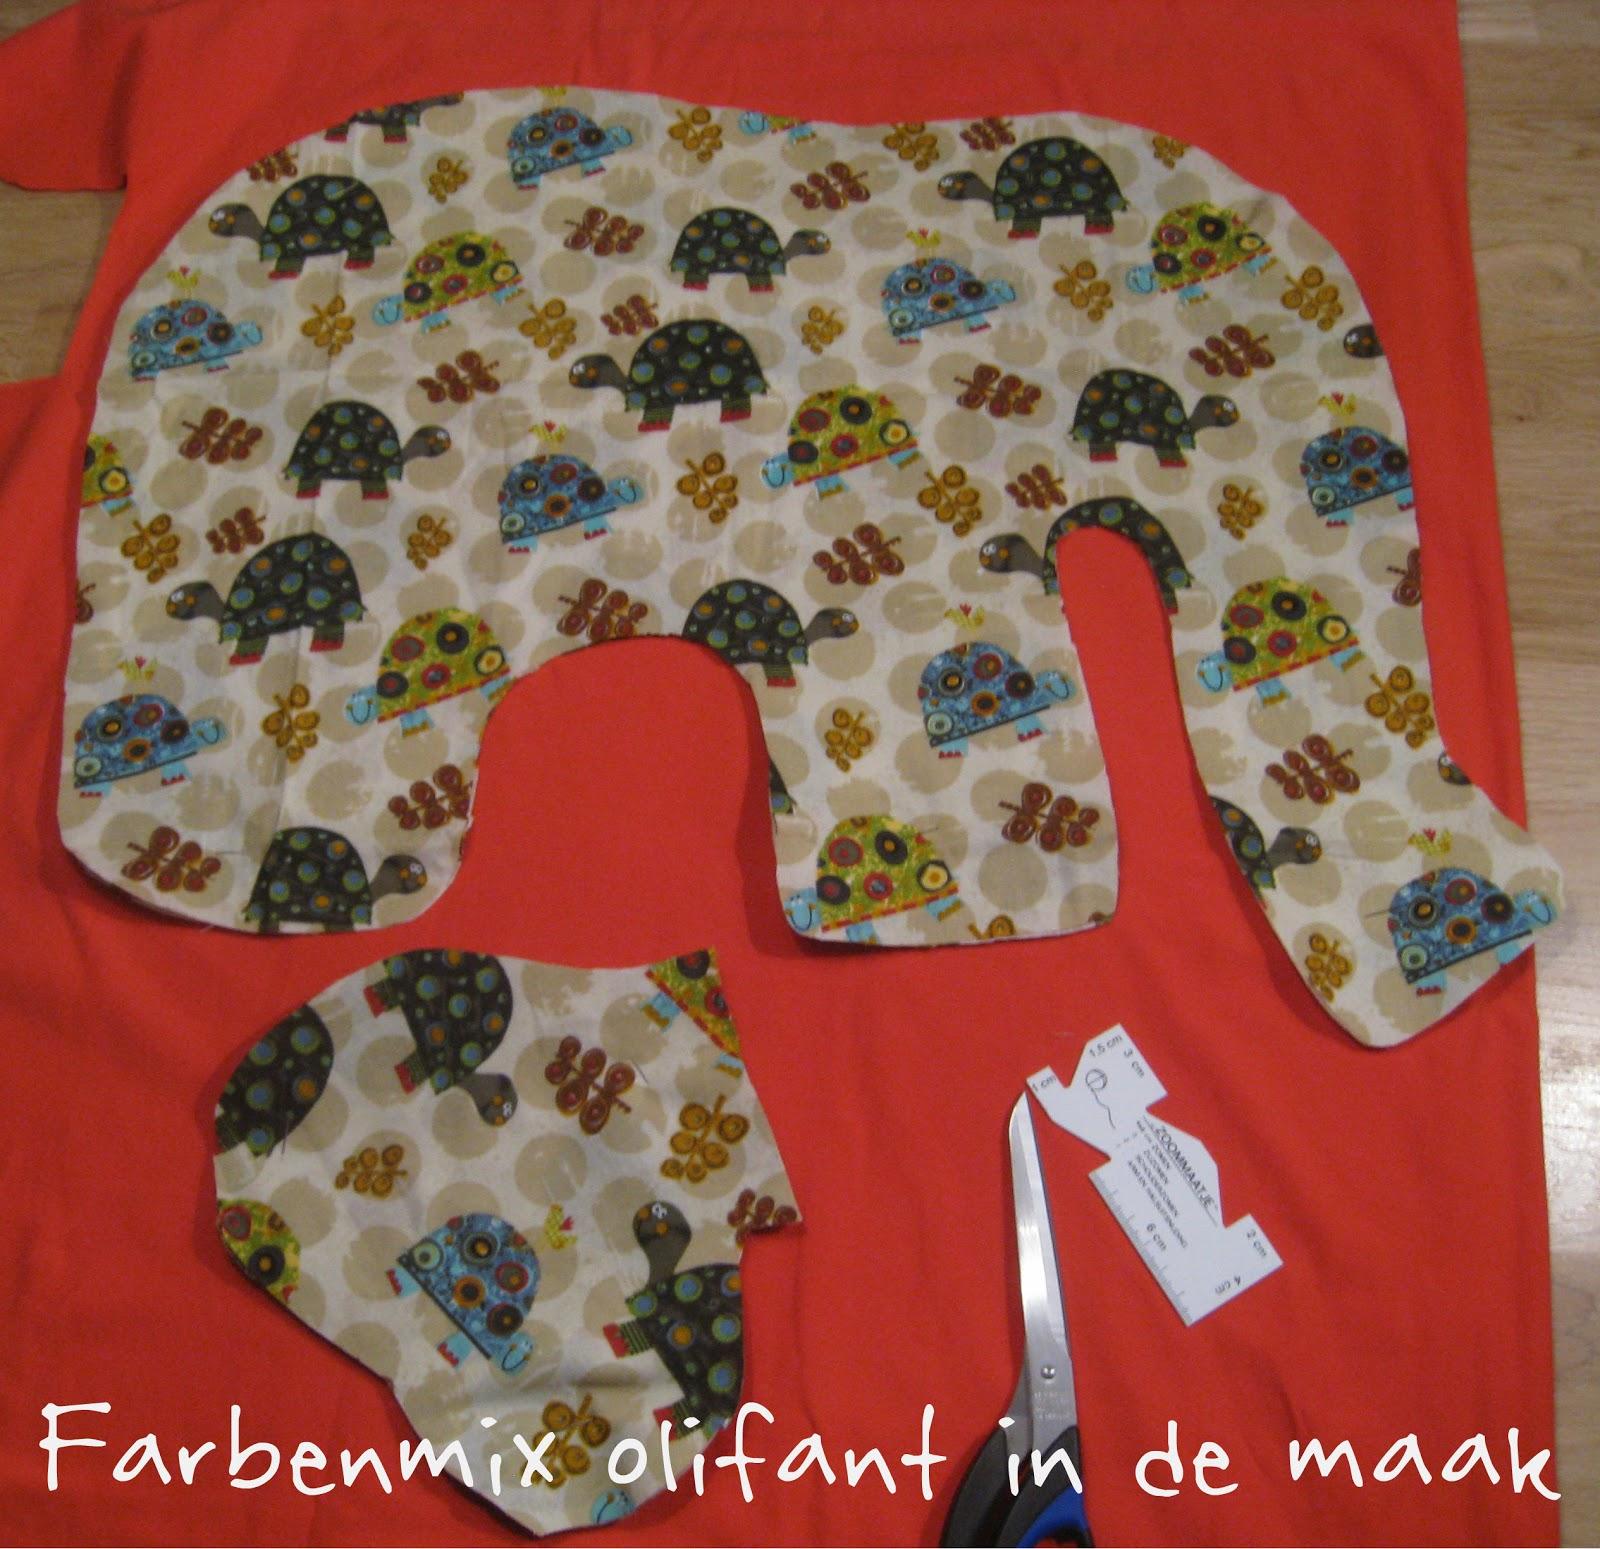 Farbenmix olifant